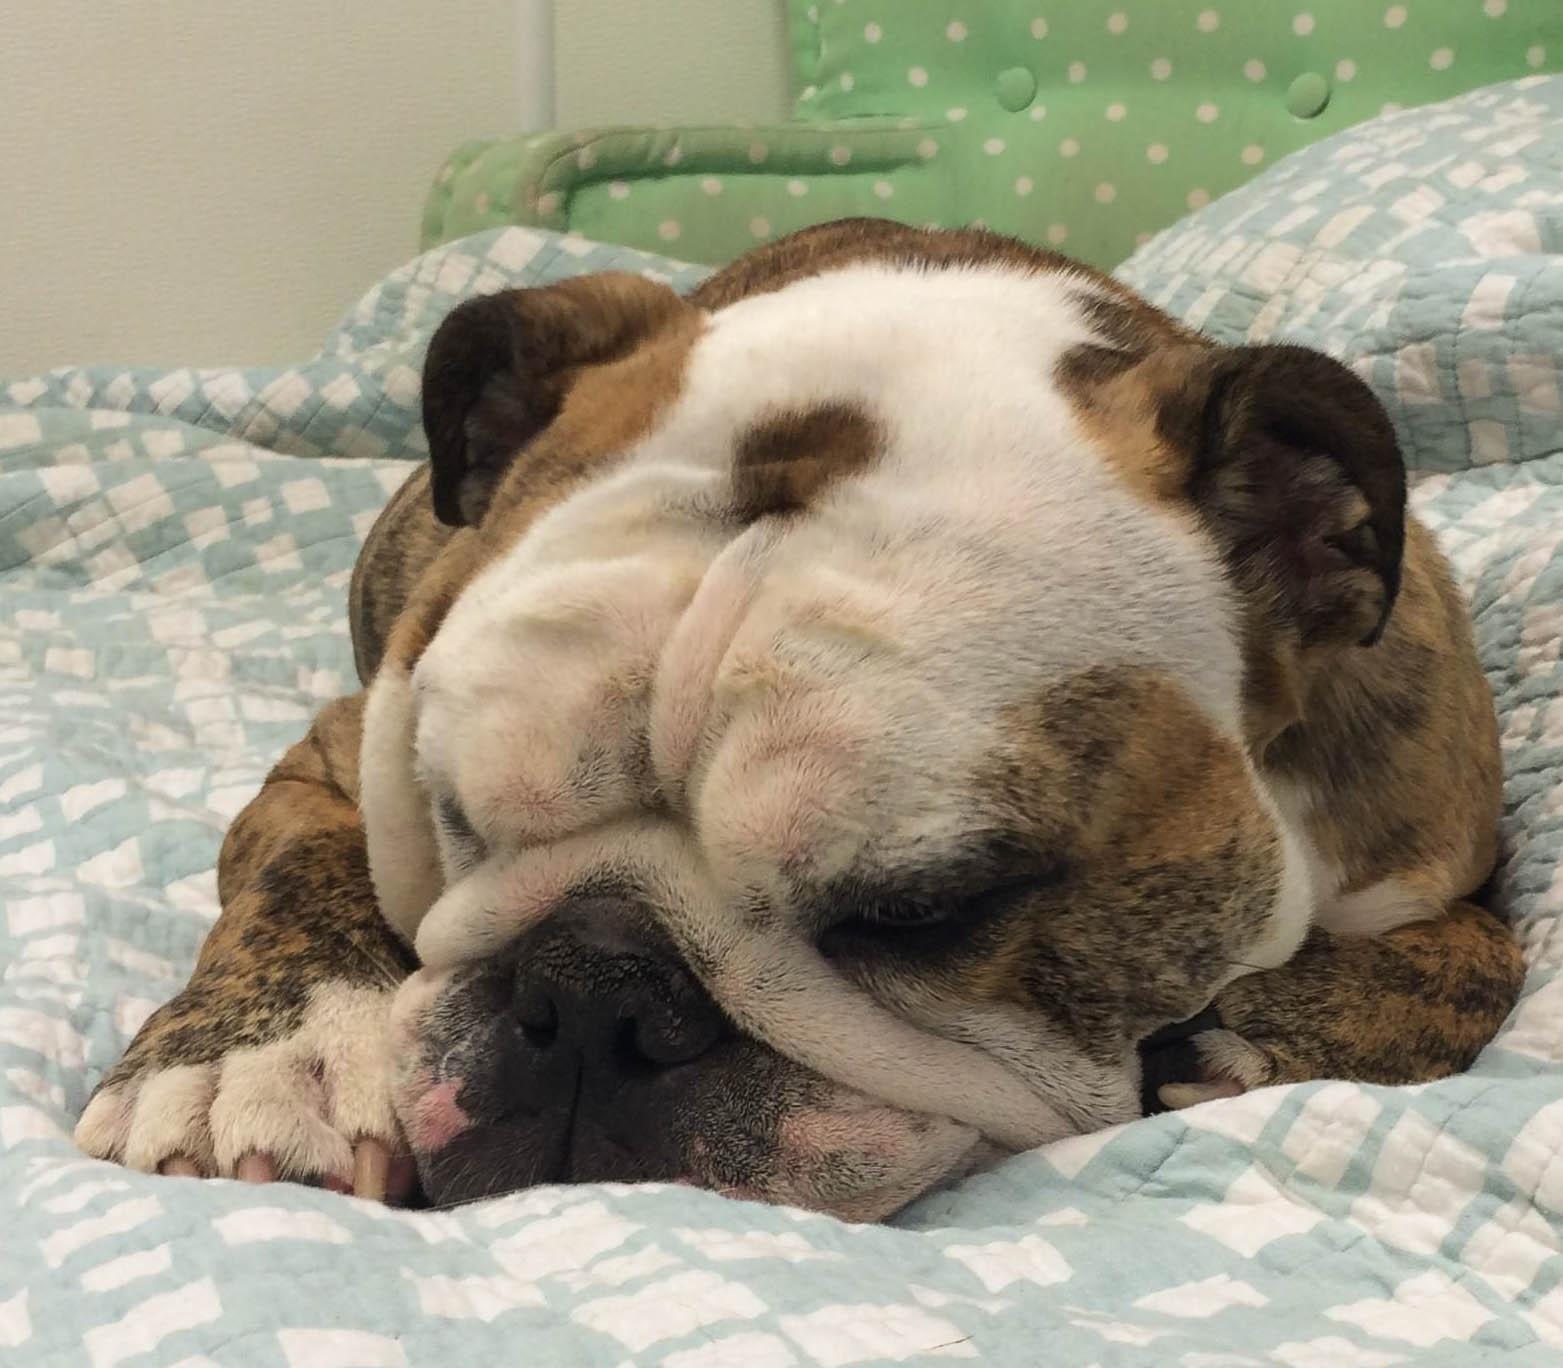 A sleeping bulldog